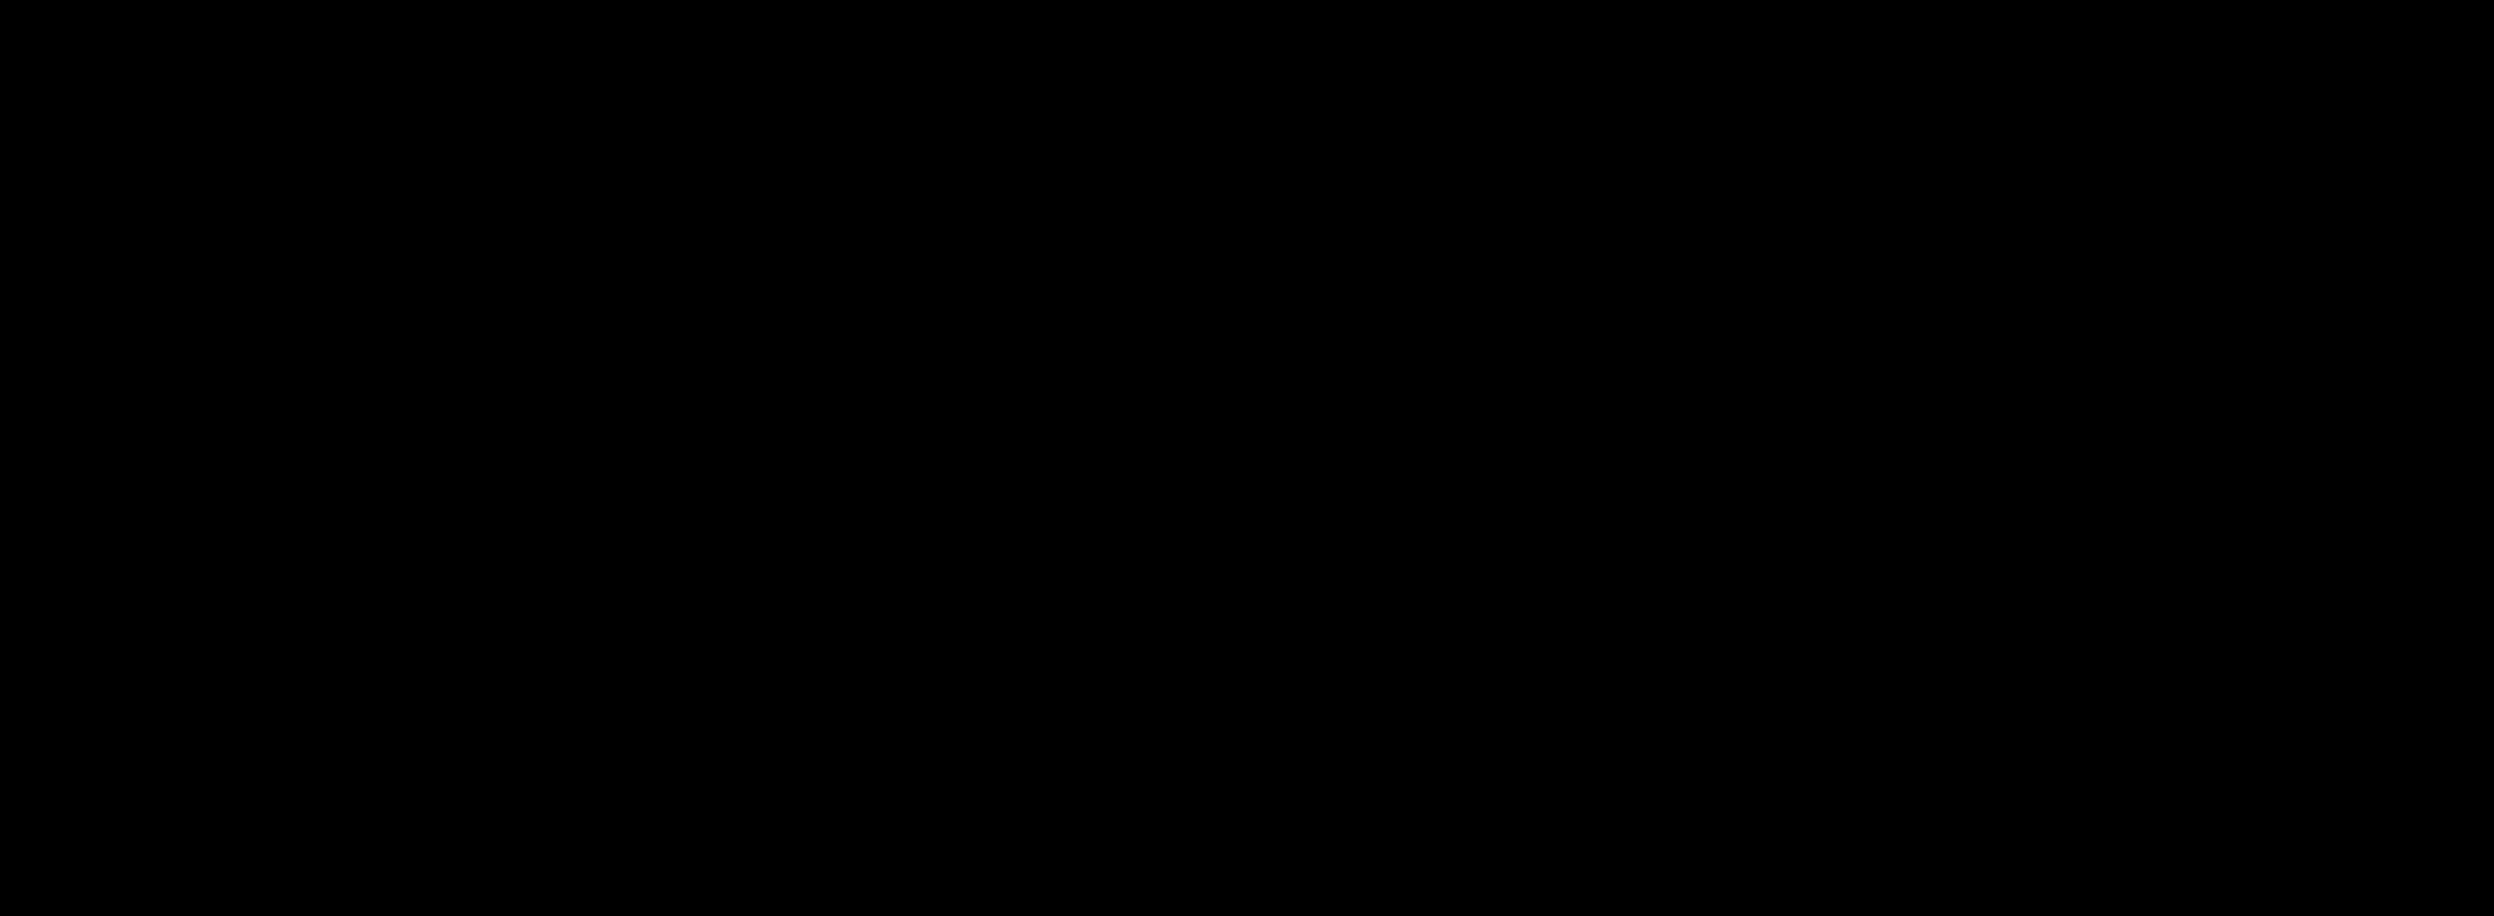 N-(8-Boc-amino-3,6-dioxaoctyl)-7-dimethylaminocoumarin-4-acetamide